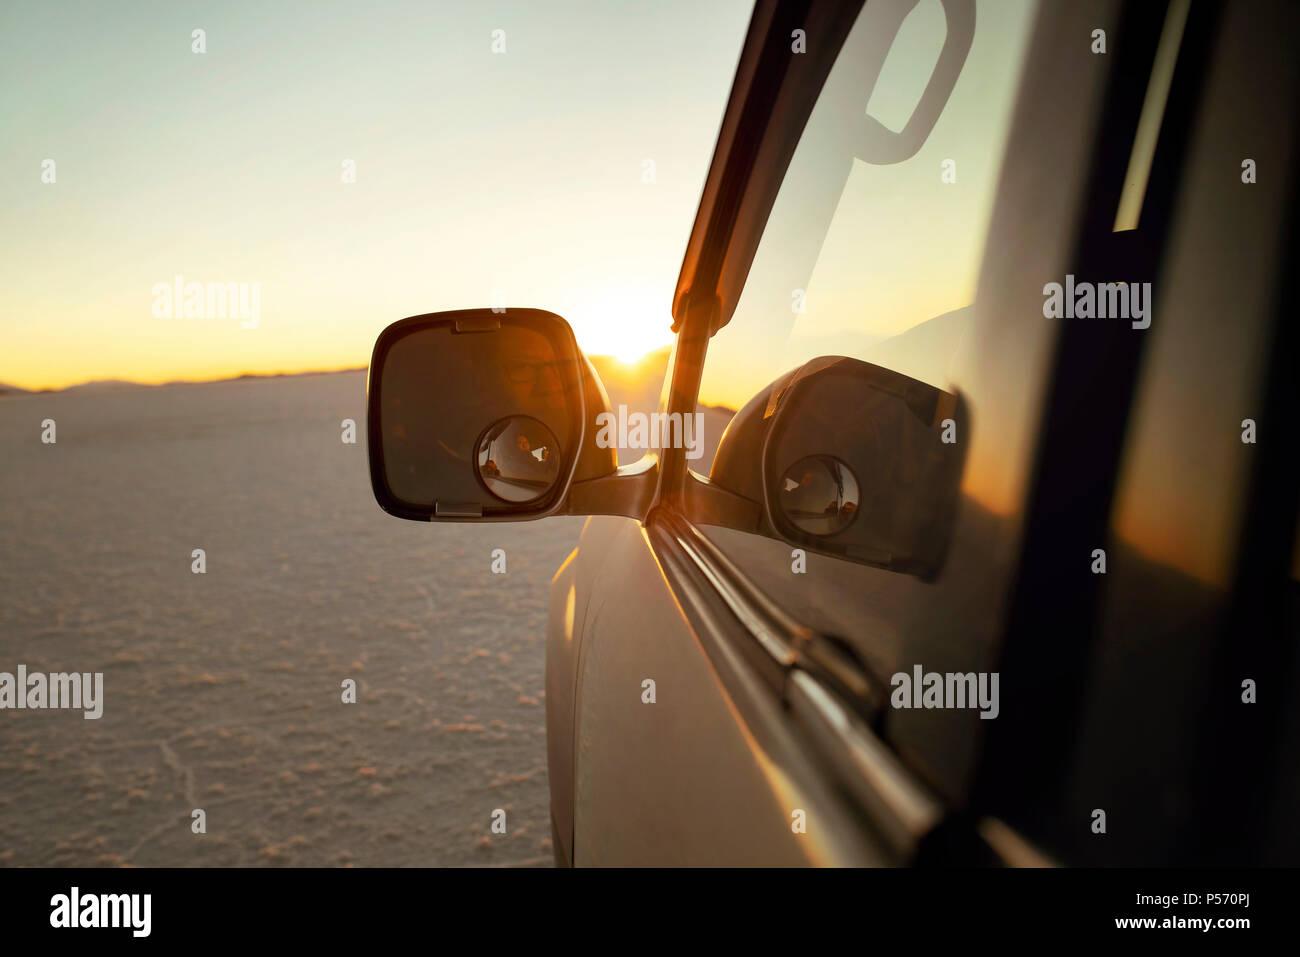 Land Cruiser parking during sunset, in the middle of Salar de Uyuni, Bolivia. Jun 2018 - Stock Image